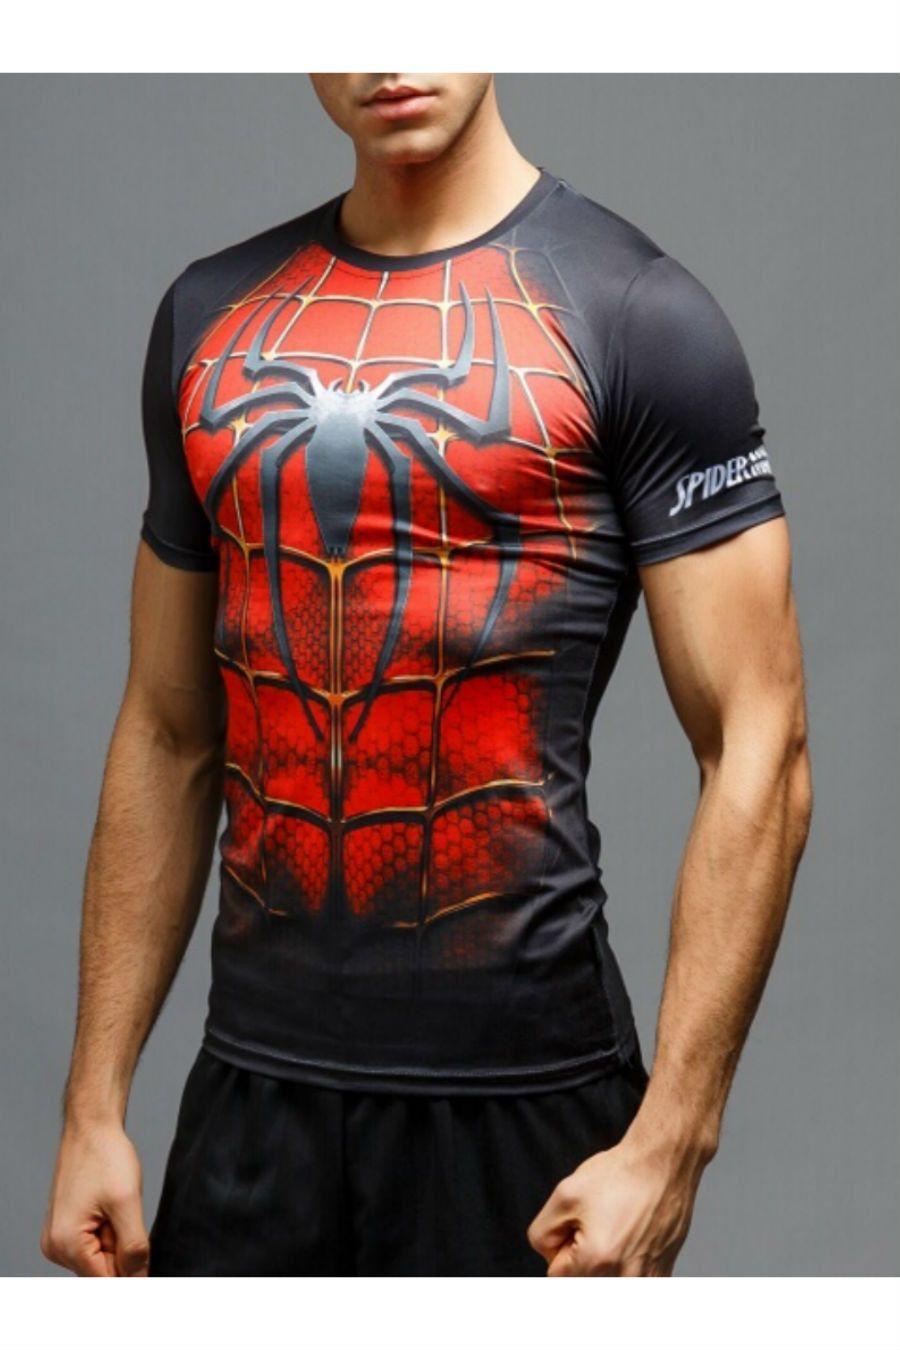 9a81c55f 3D Spiderman Short Sleeve Tee | Super Heroes & Villian's Gear ...